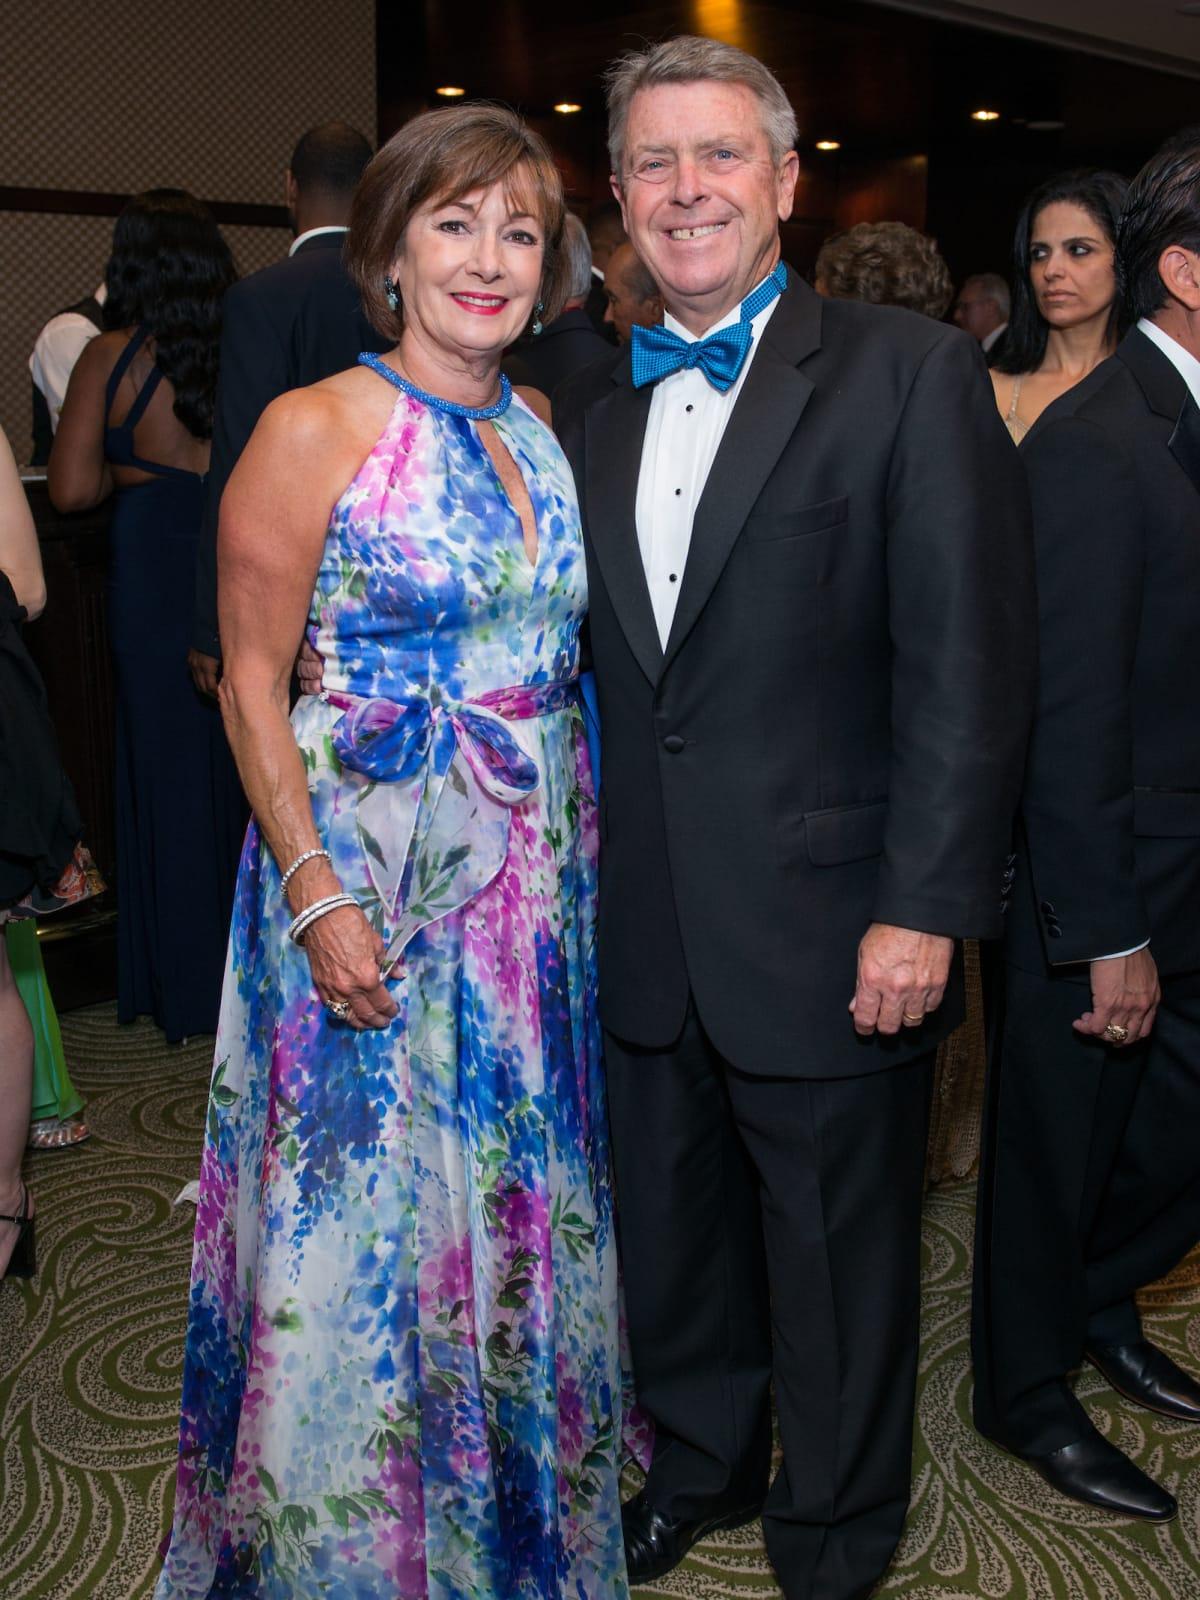 Cathy and Joe Cleary at Memorial Hermann Gala